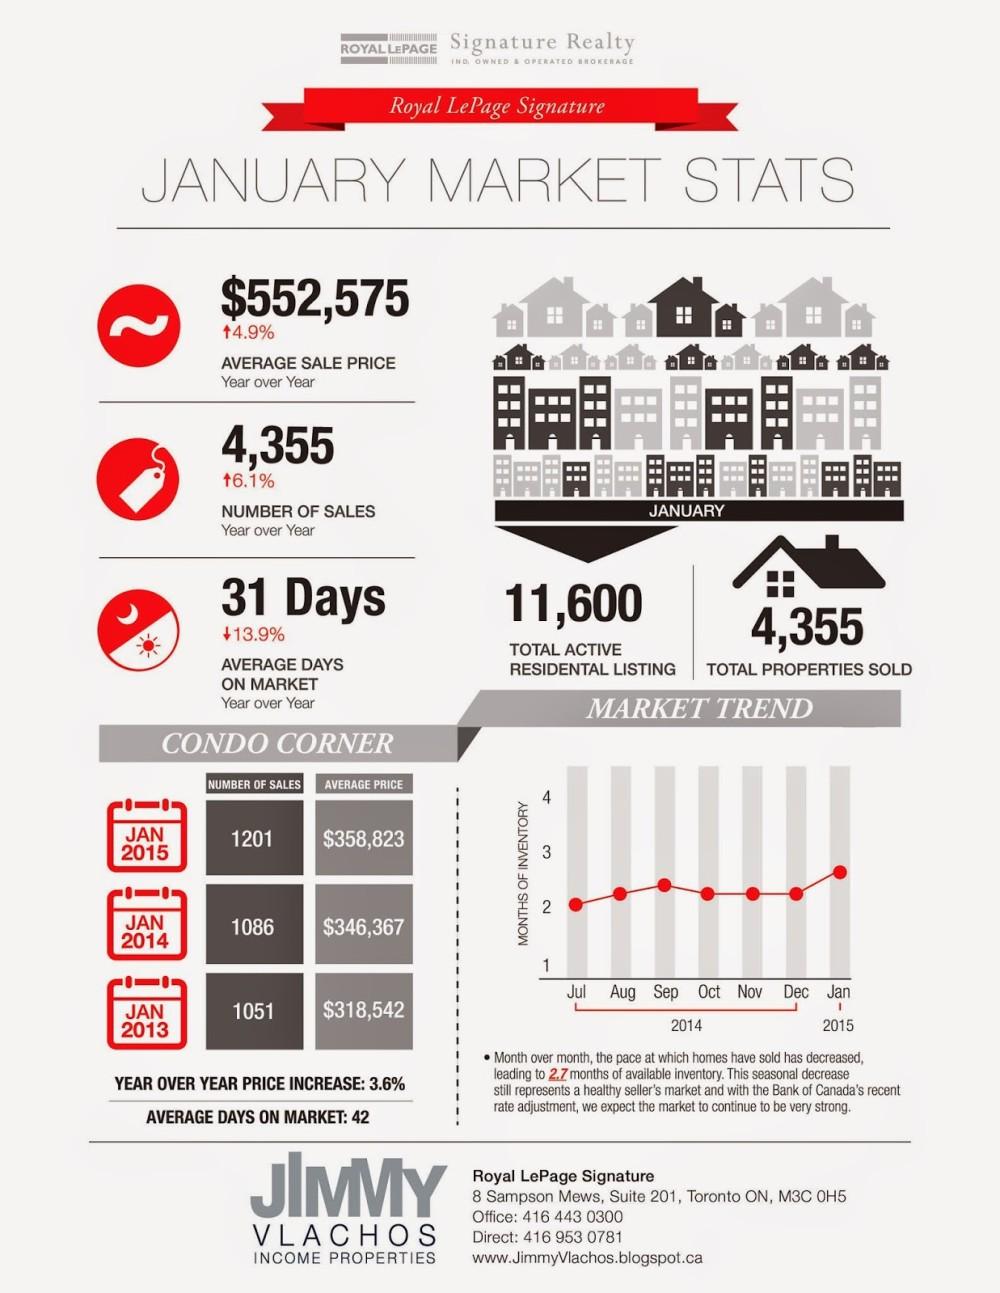 JimmyVlachos_StatsInfographic_JAN_Feb7_2015